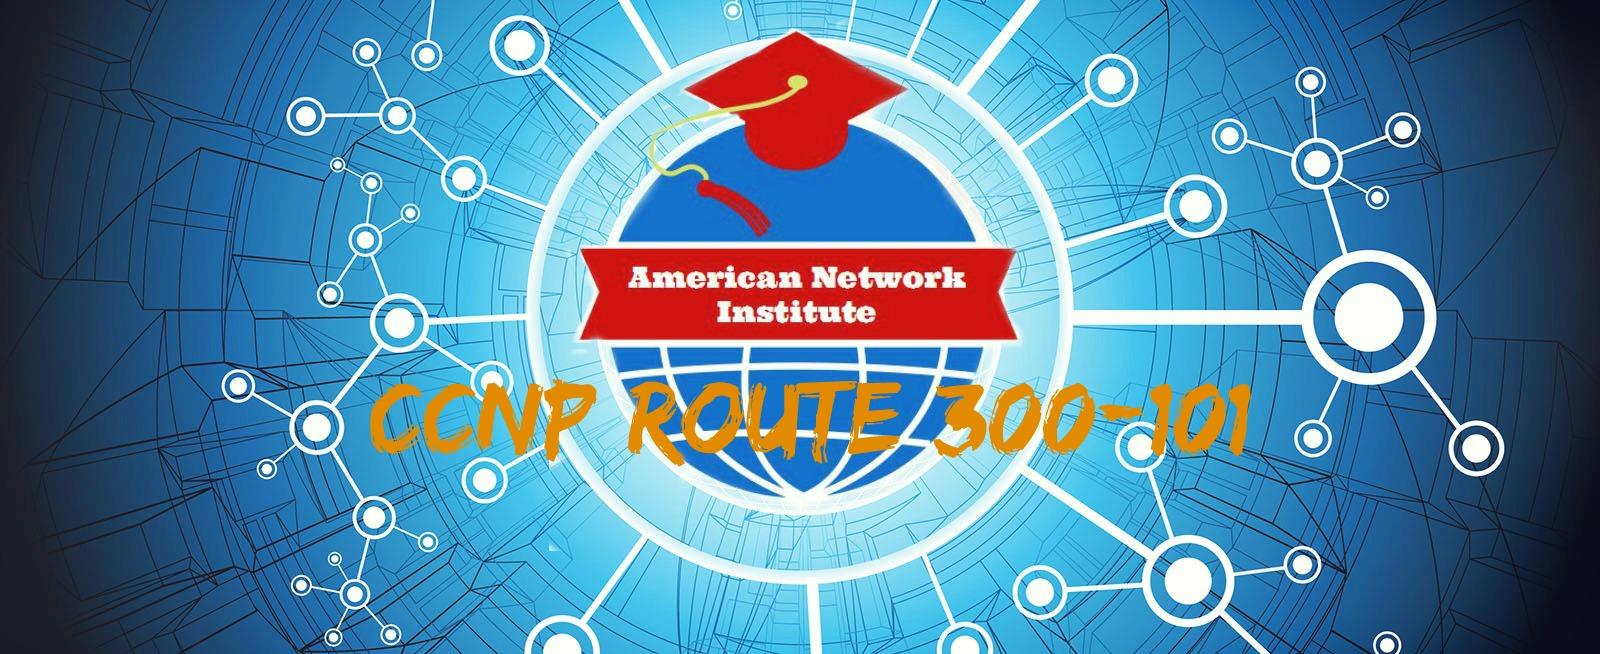 American Network Institute